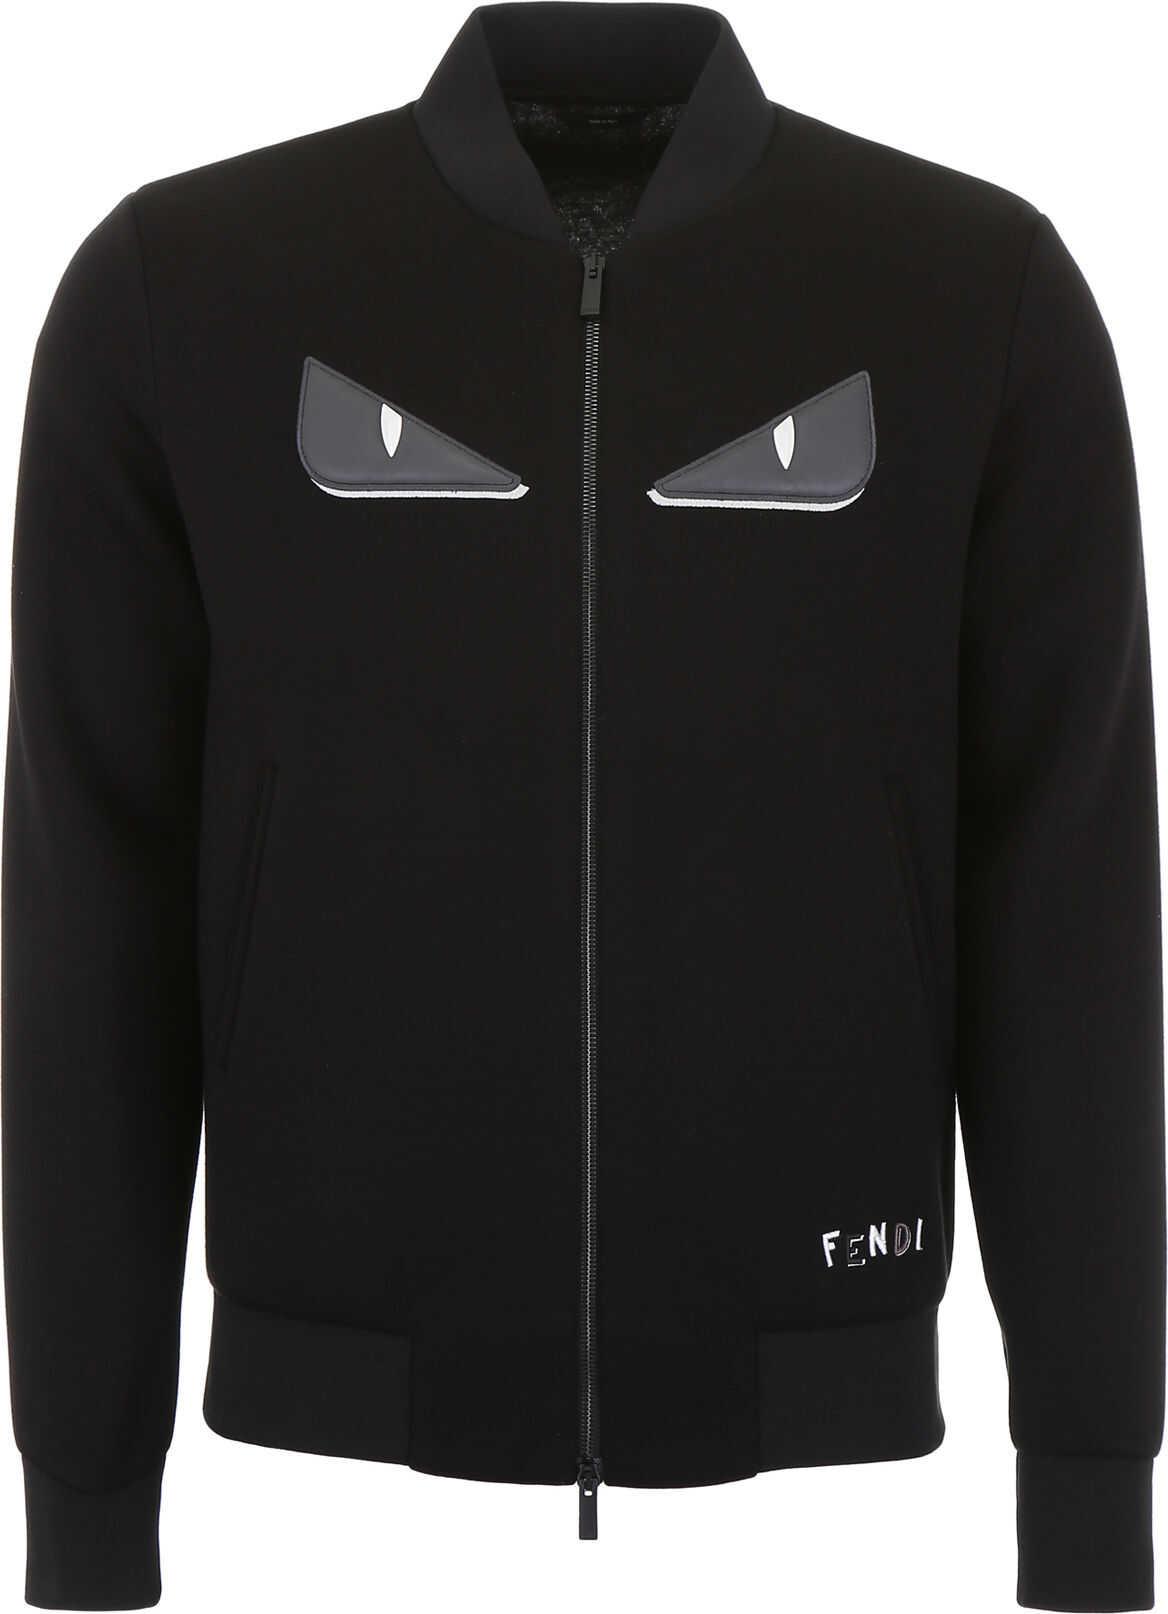 Fendi Shadow Embroidery Jacket NERO